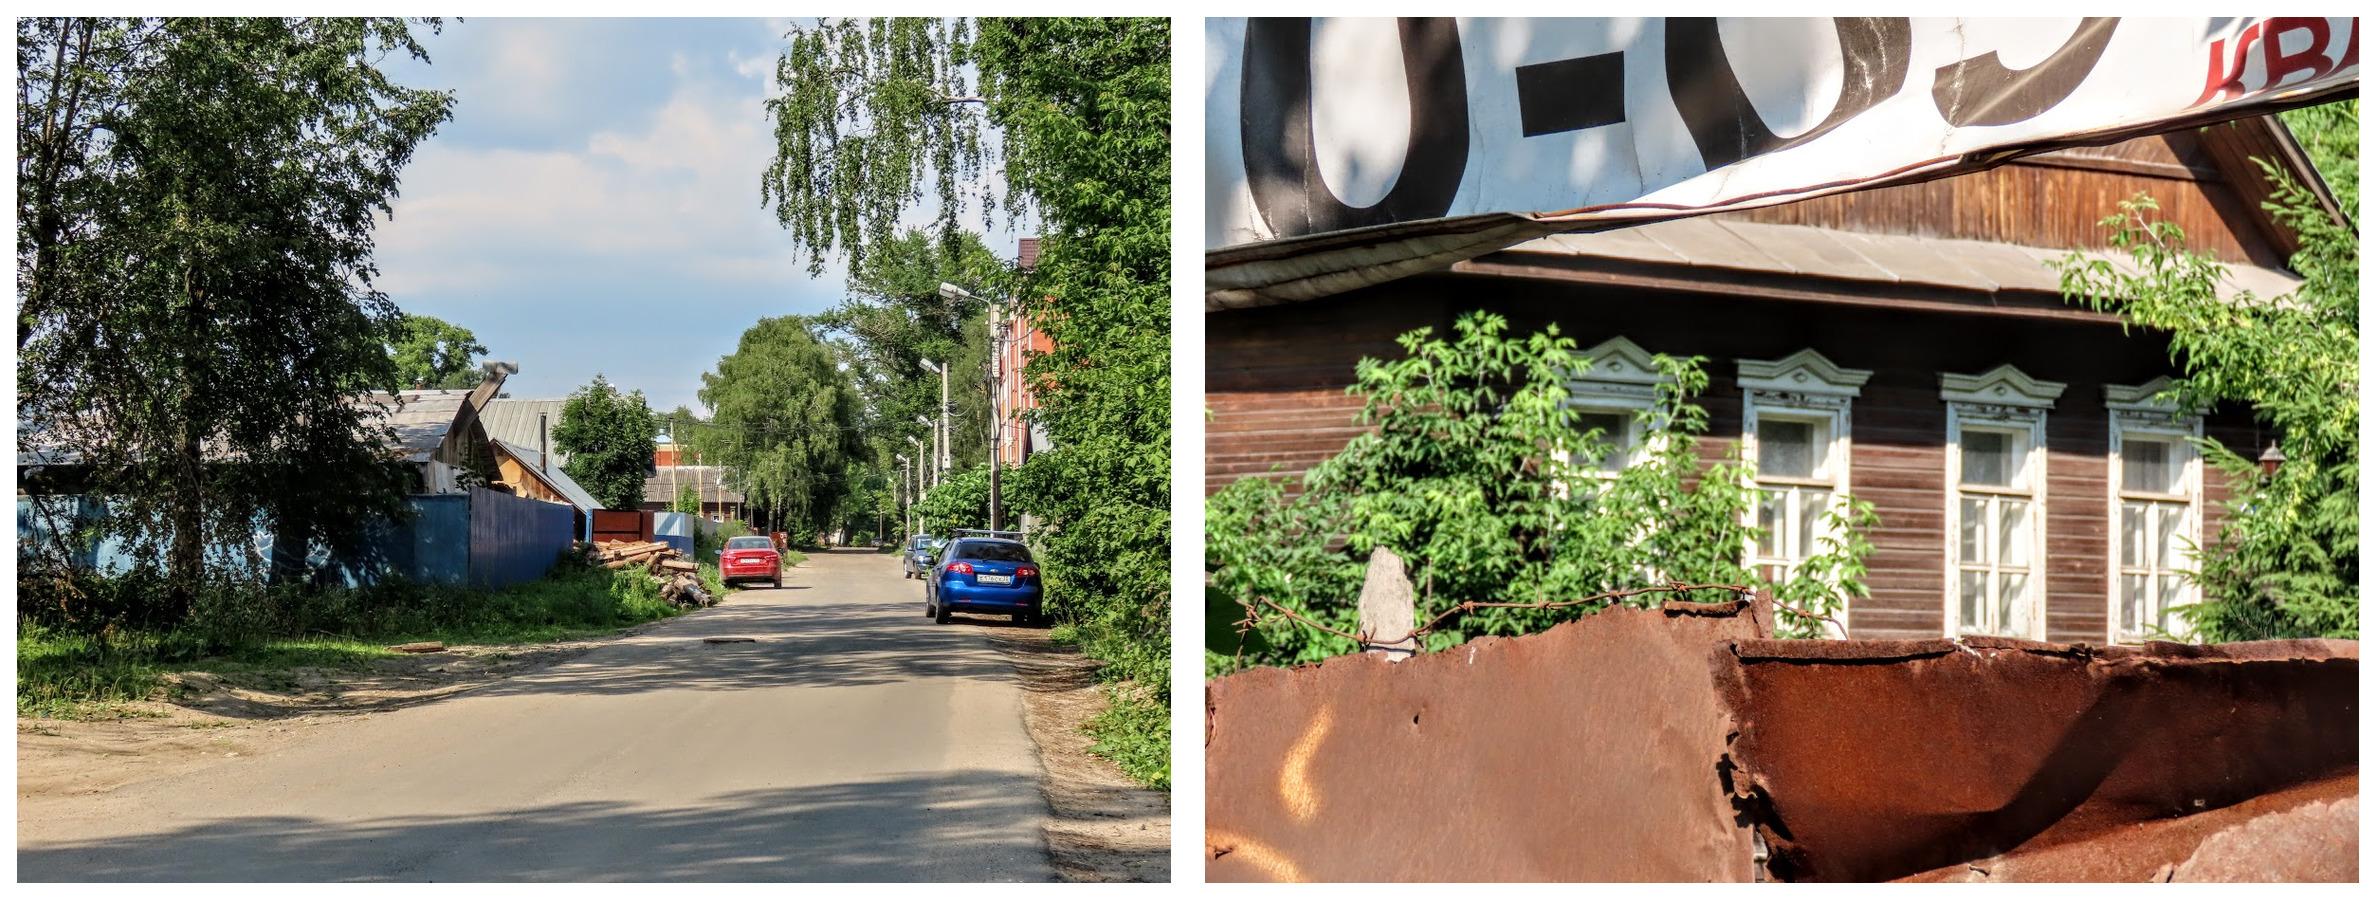 imgonline-com-ua-Collage-w-FOn7sh-Xf-So6a-Mq